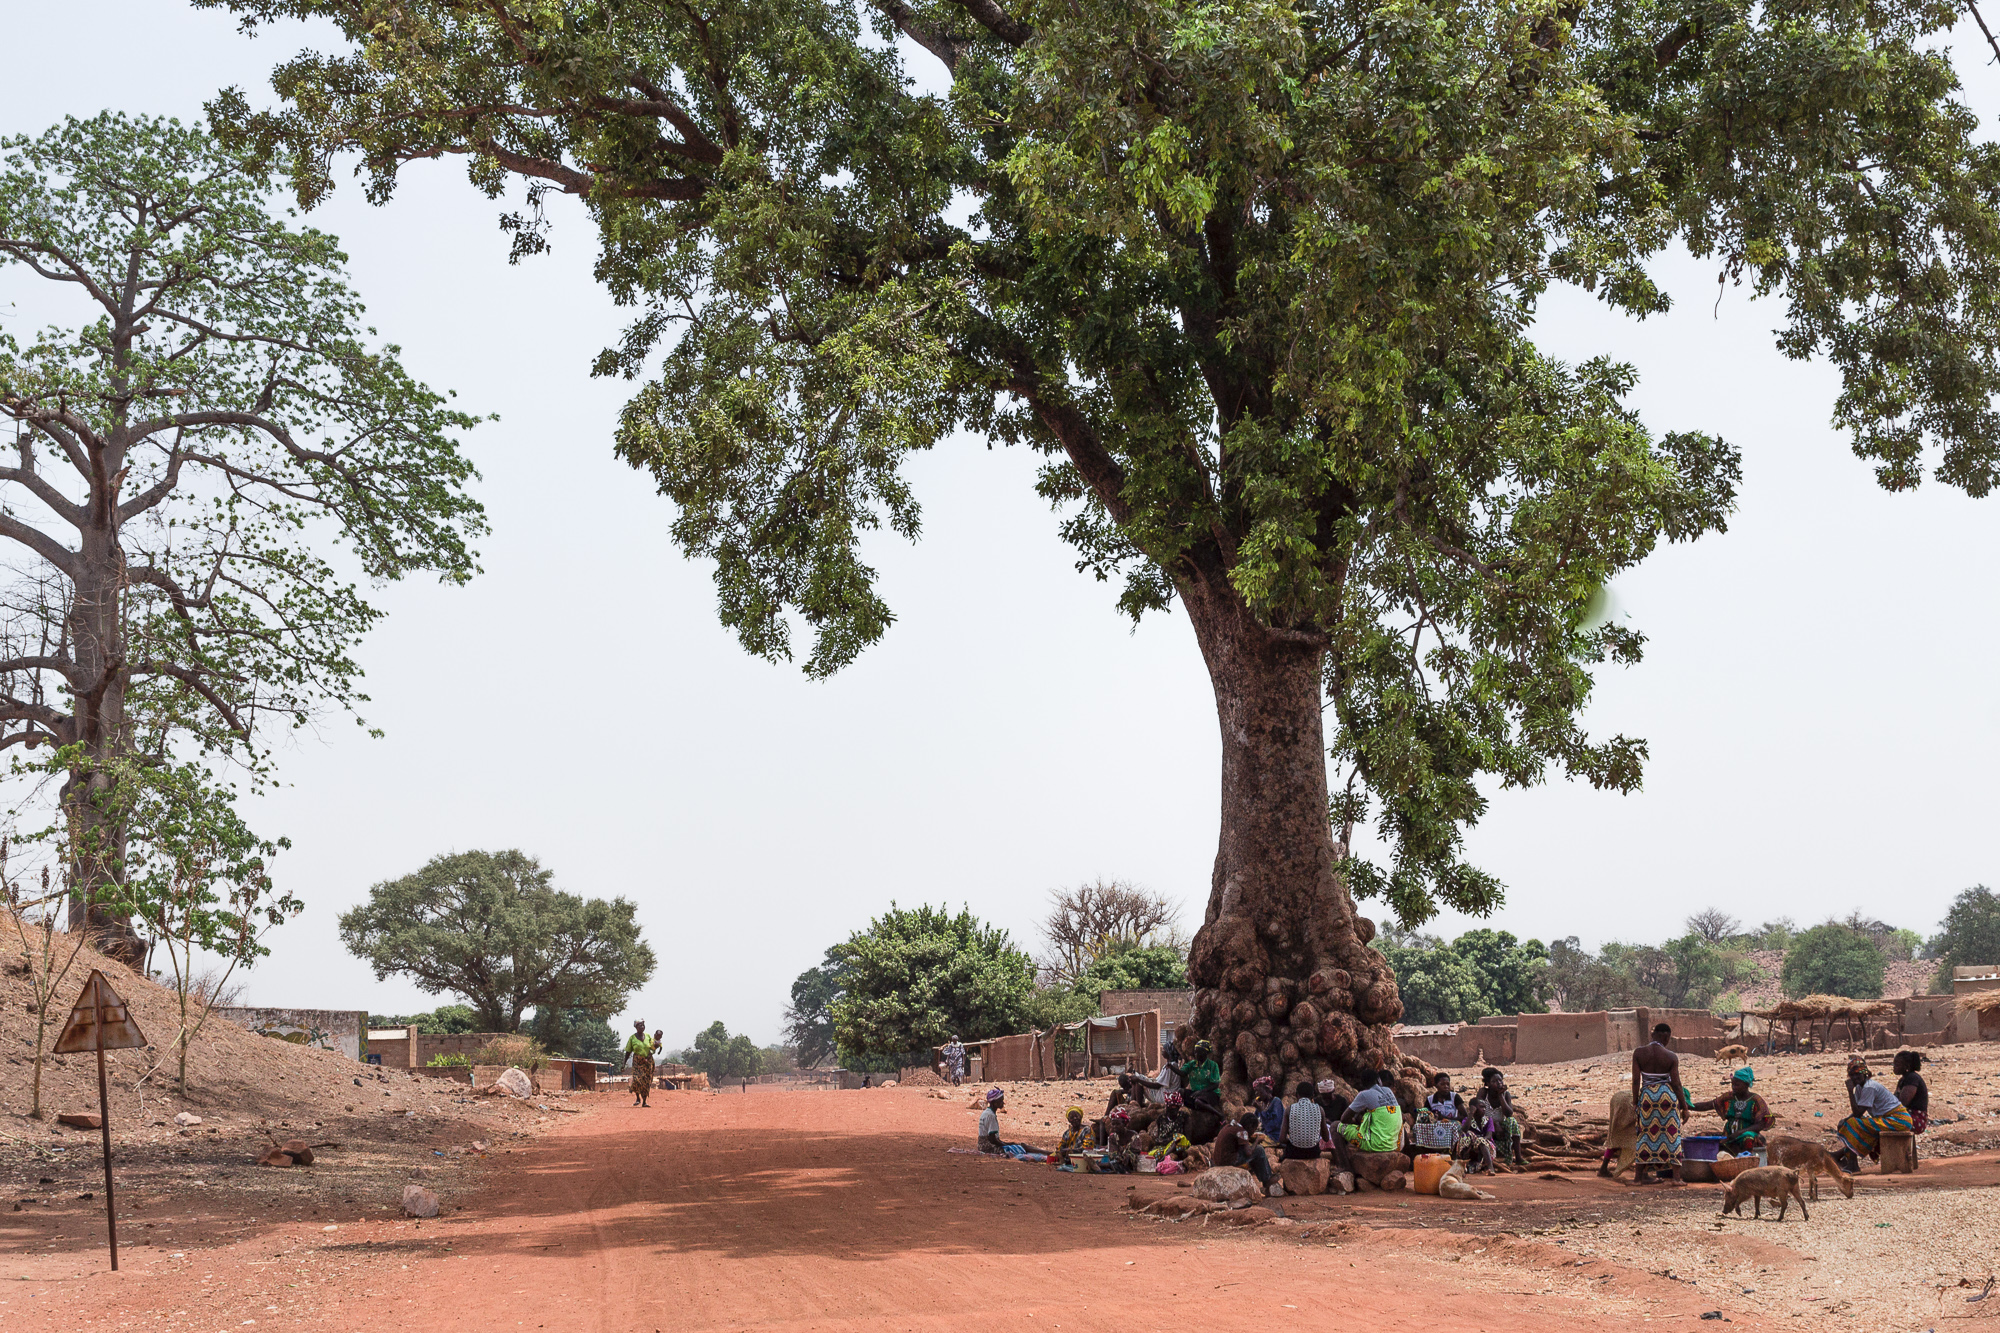 Attroupement sous un caïlcedrat, ombre, arbre, piste rouge, Burkina Faso